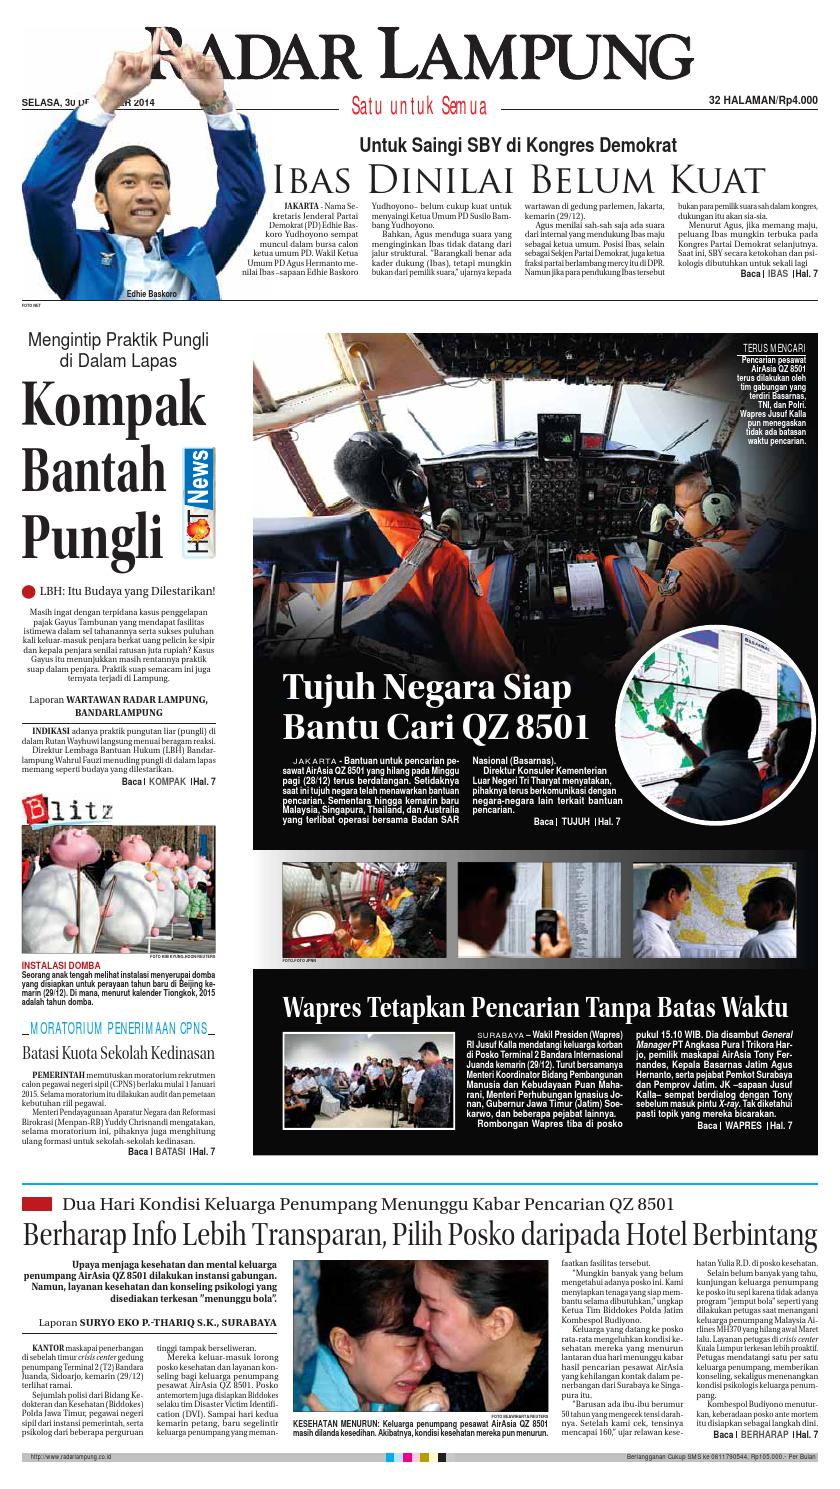 Radar Lampung Selasa 30 Desember 2014 By Ayep Kancee Issuu Mainan Mobil Anak Tomica Limited Vintage Series Datsun Bluebird 1300 Standard